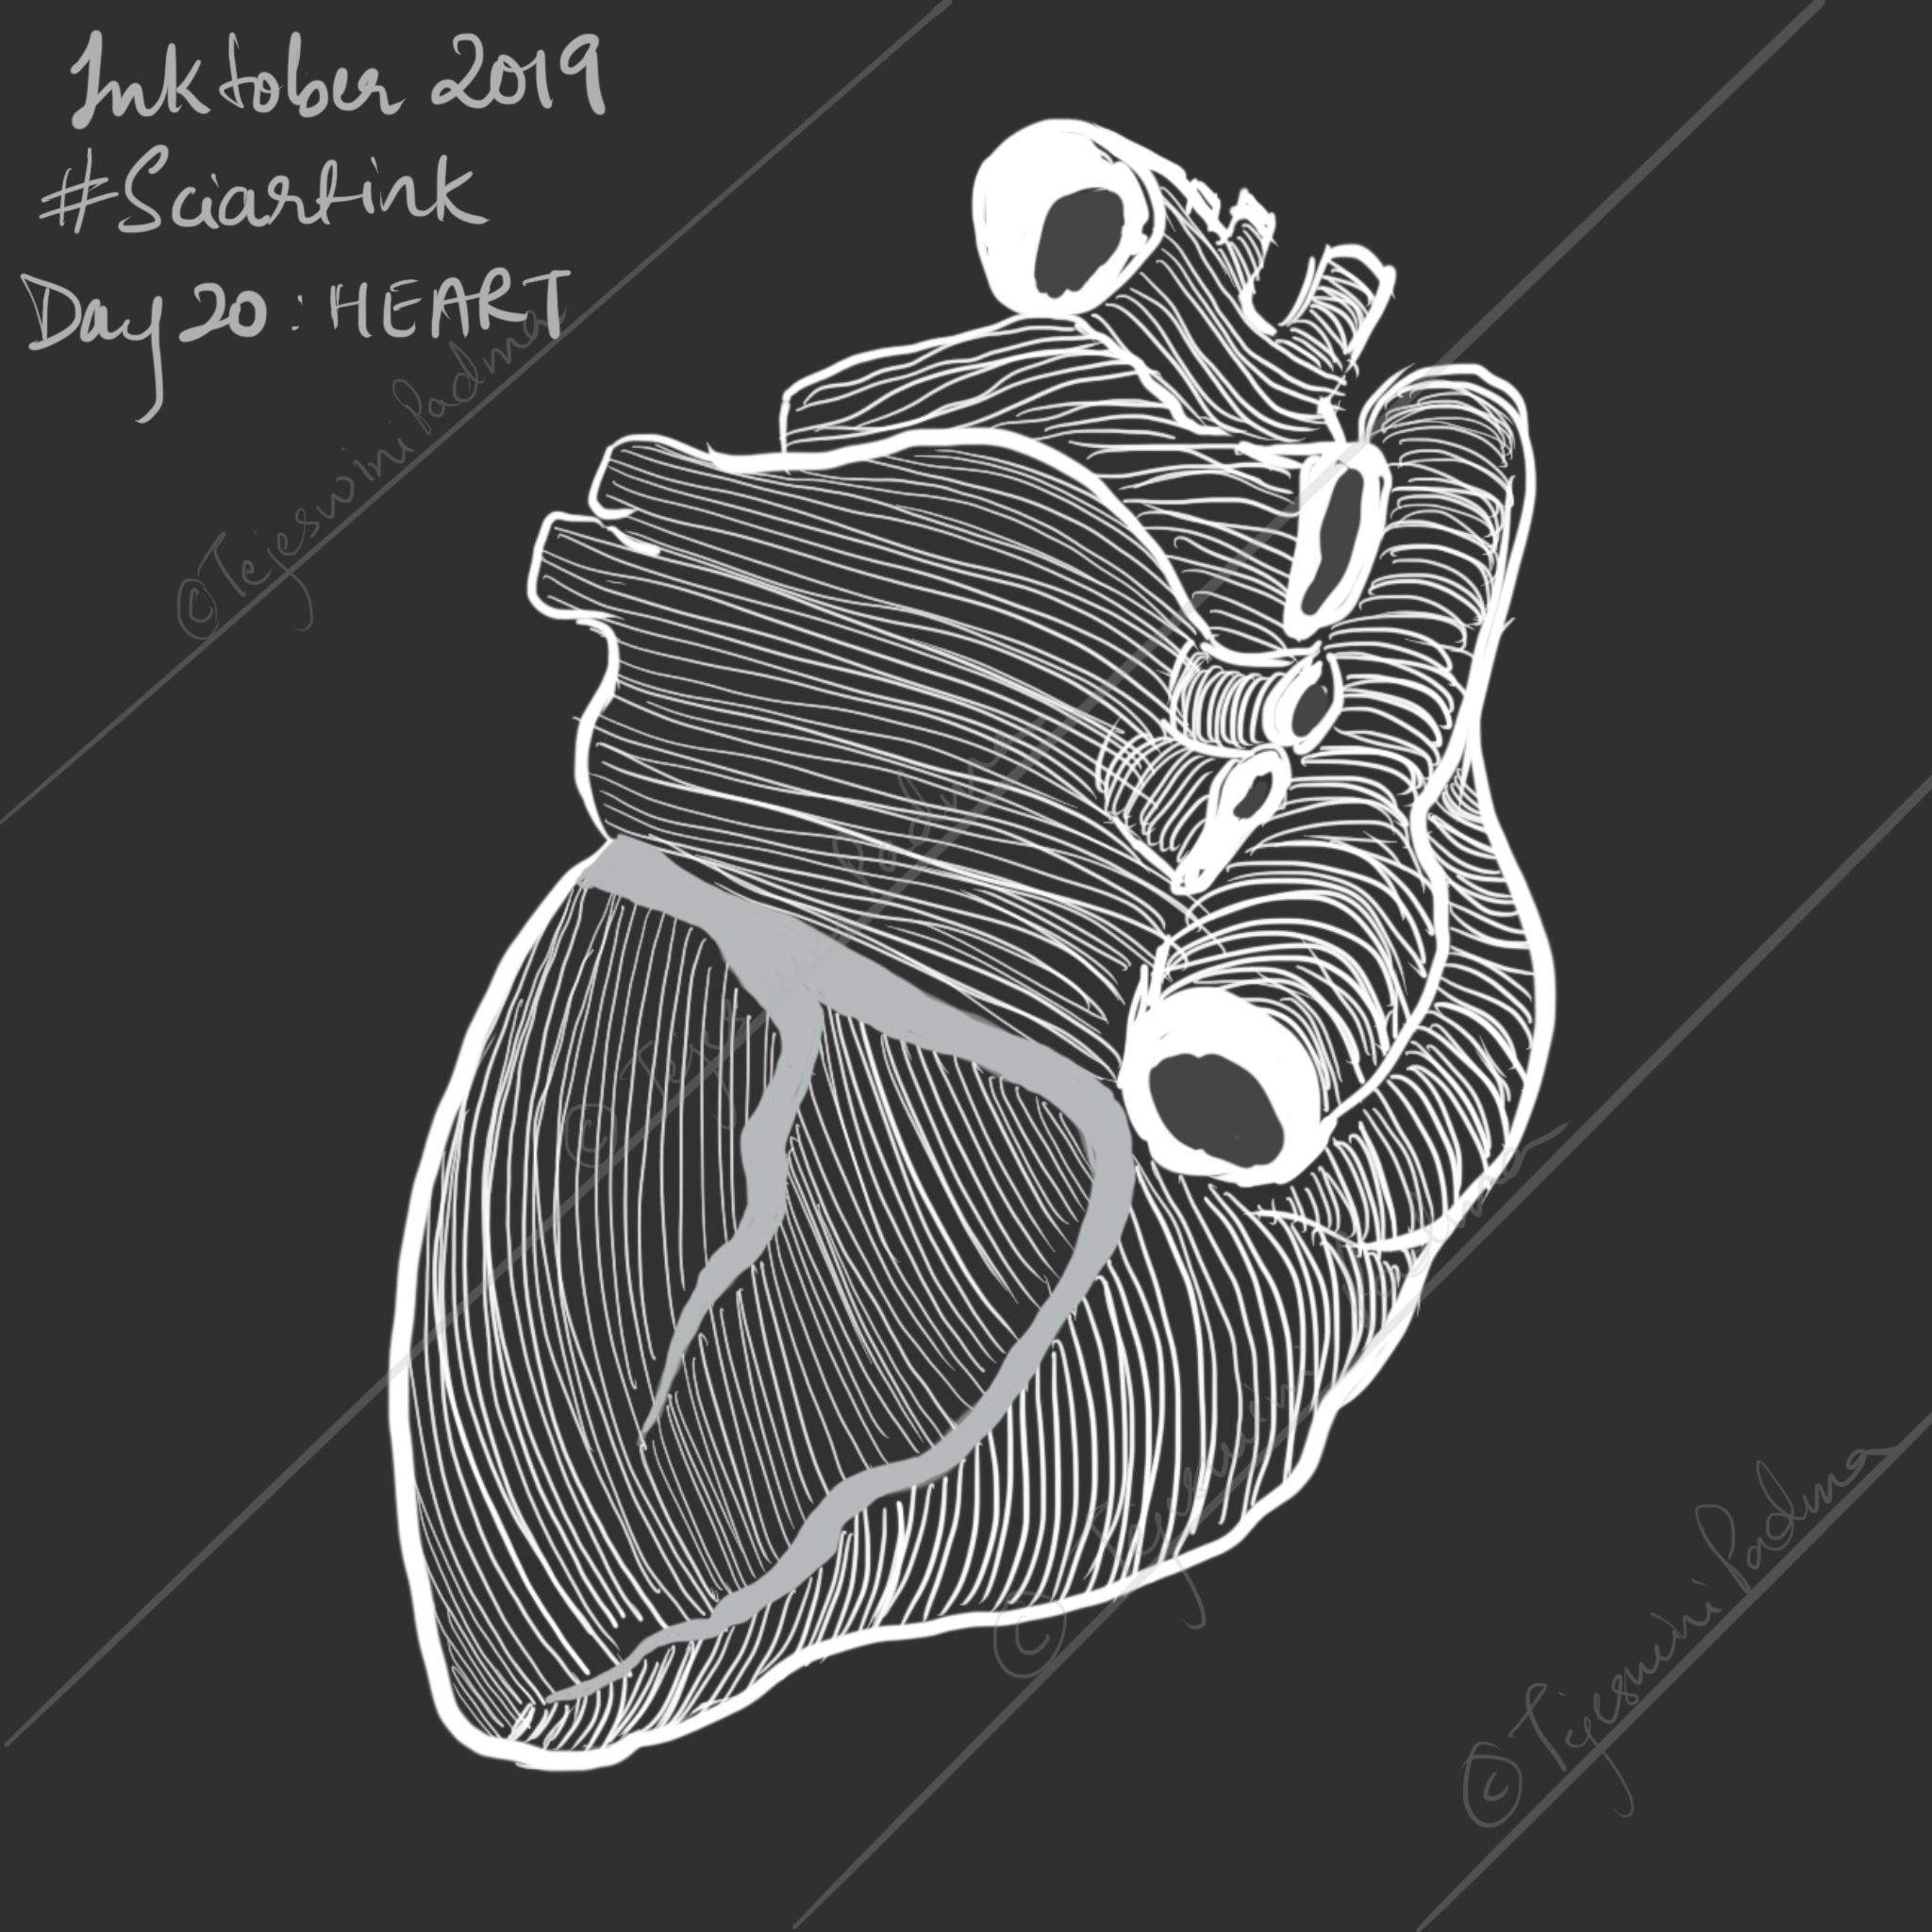 20_Inktober_2019_Heart